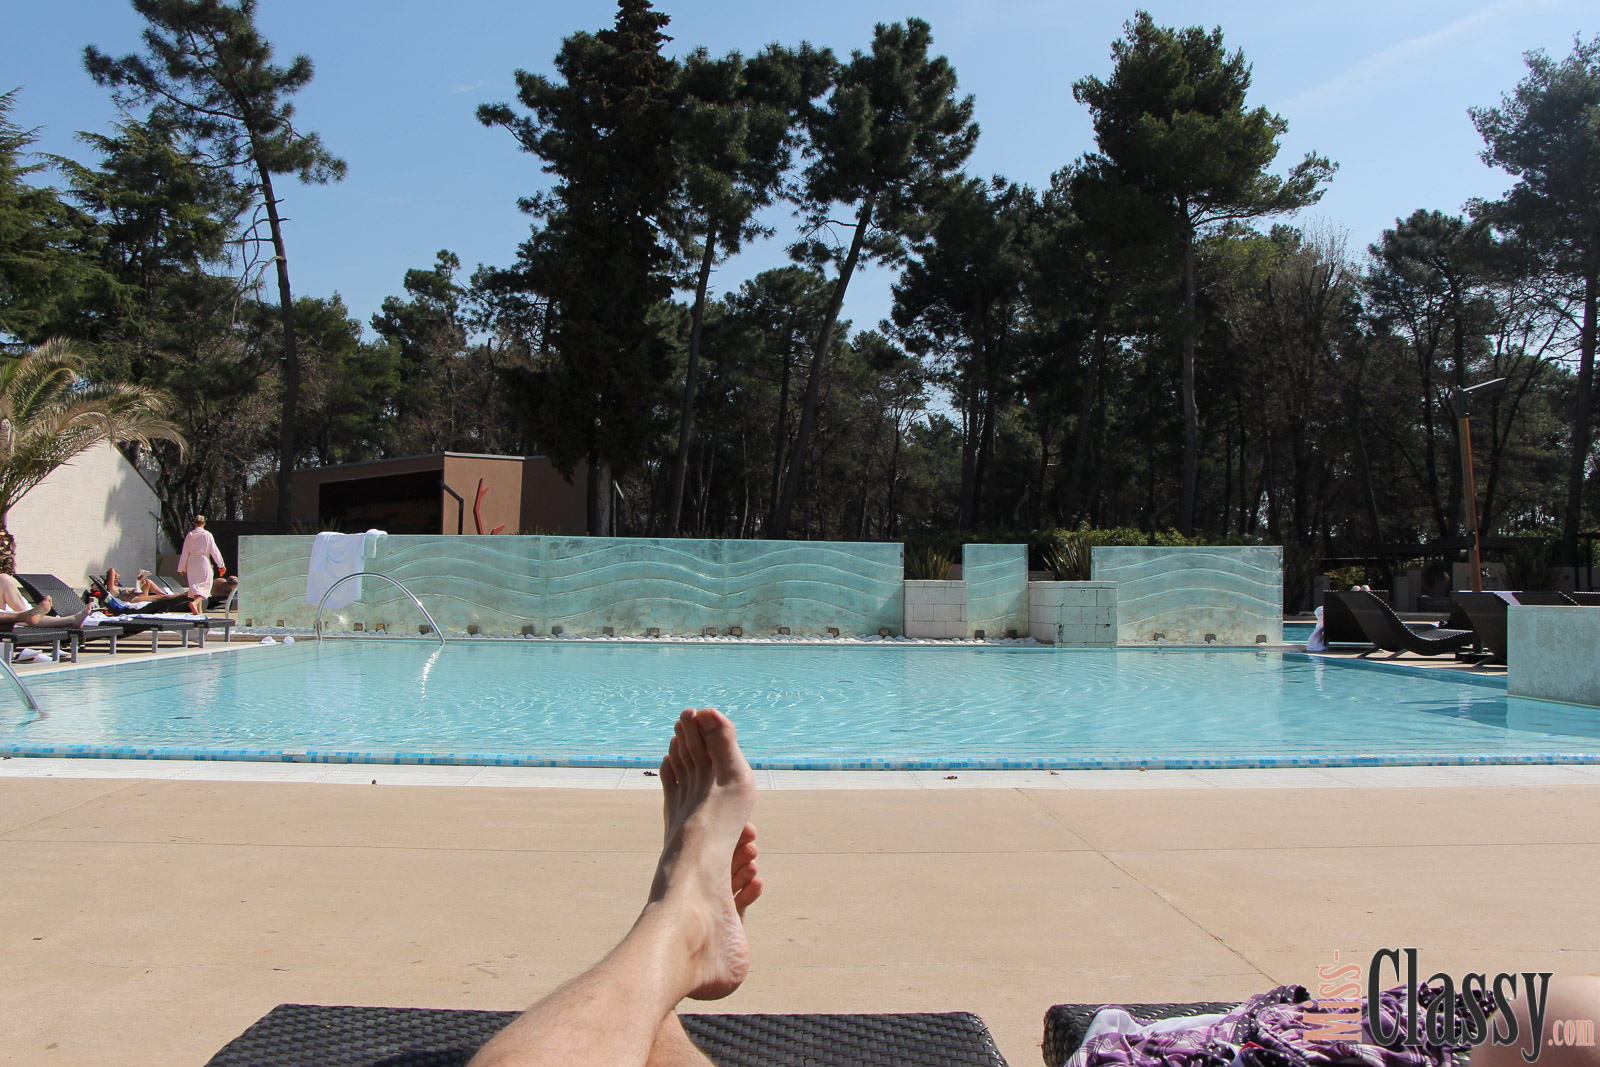 TRAVEL Melia Coral Umag, Miss Classy, miss-classy.com, Lifestyleblog, Lifestyleblogger, Lifestyleblog Graz, Travelblog, Travelblogger, Graz, Steiermark, Österreich, classy, beclassy, Reise, Travel, Wanderlust, Wayfarer, Umag, Kroatien, Istrien, Meer, Hotel, Hotelreview, 5 Sterne Hotel Umag, Wochenendtrip, Hotelpool, Sonnenliege